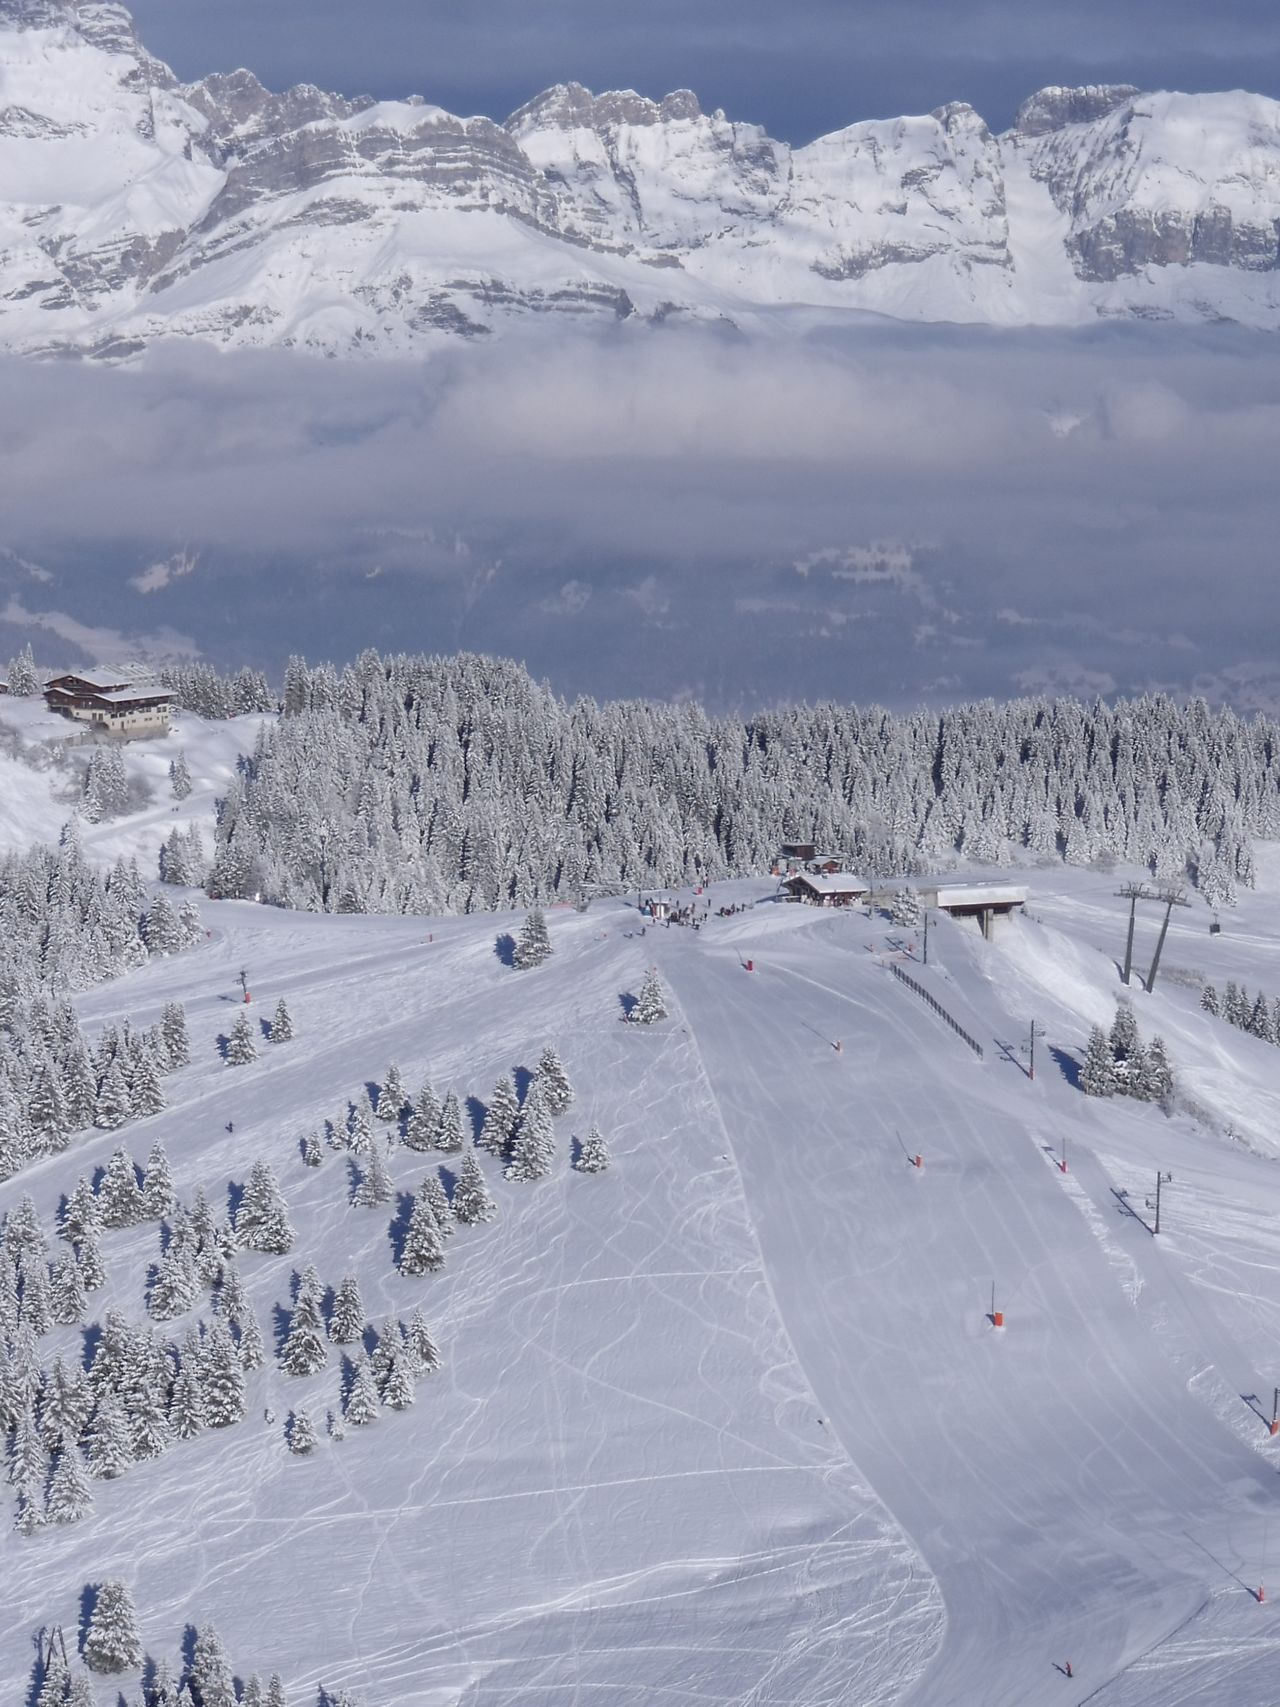 Cold Cold Temperature Covering Frozen Landscape Mountain Mountain Range Saint Gervais Season  Ski Snow Snow Covered Snowcapped Snowcapped Mountain Weather White Winter